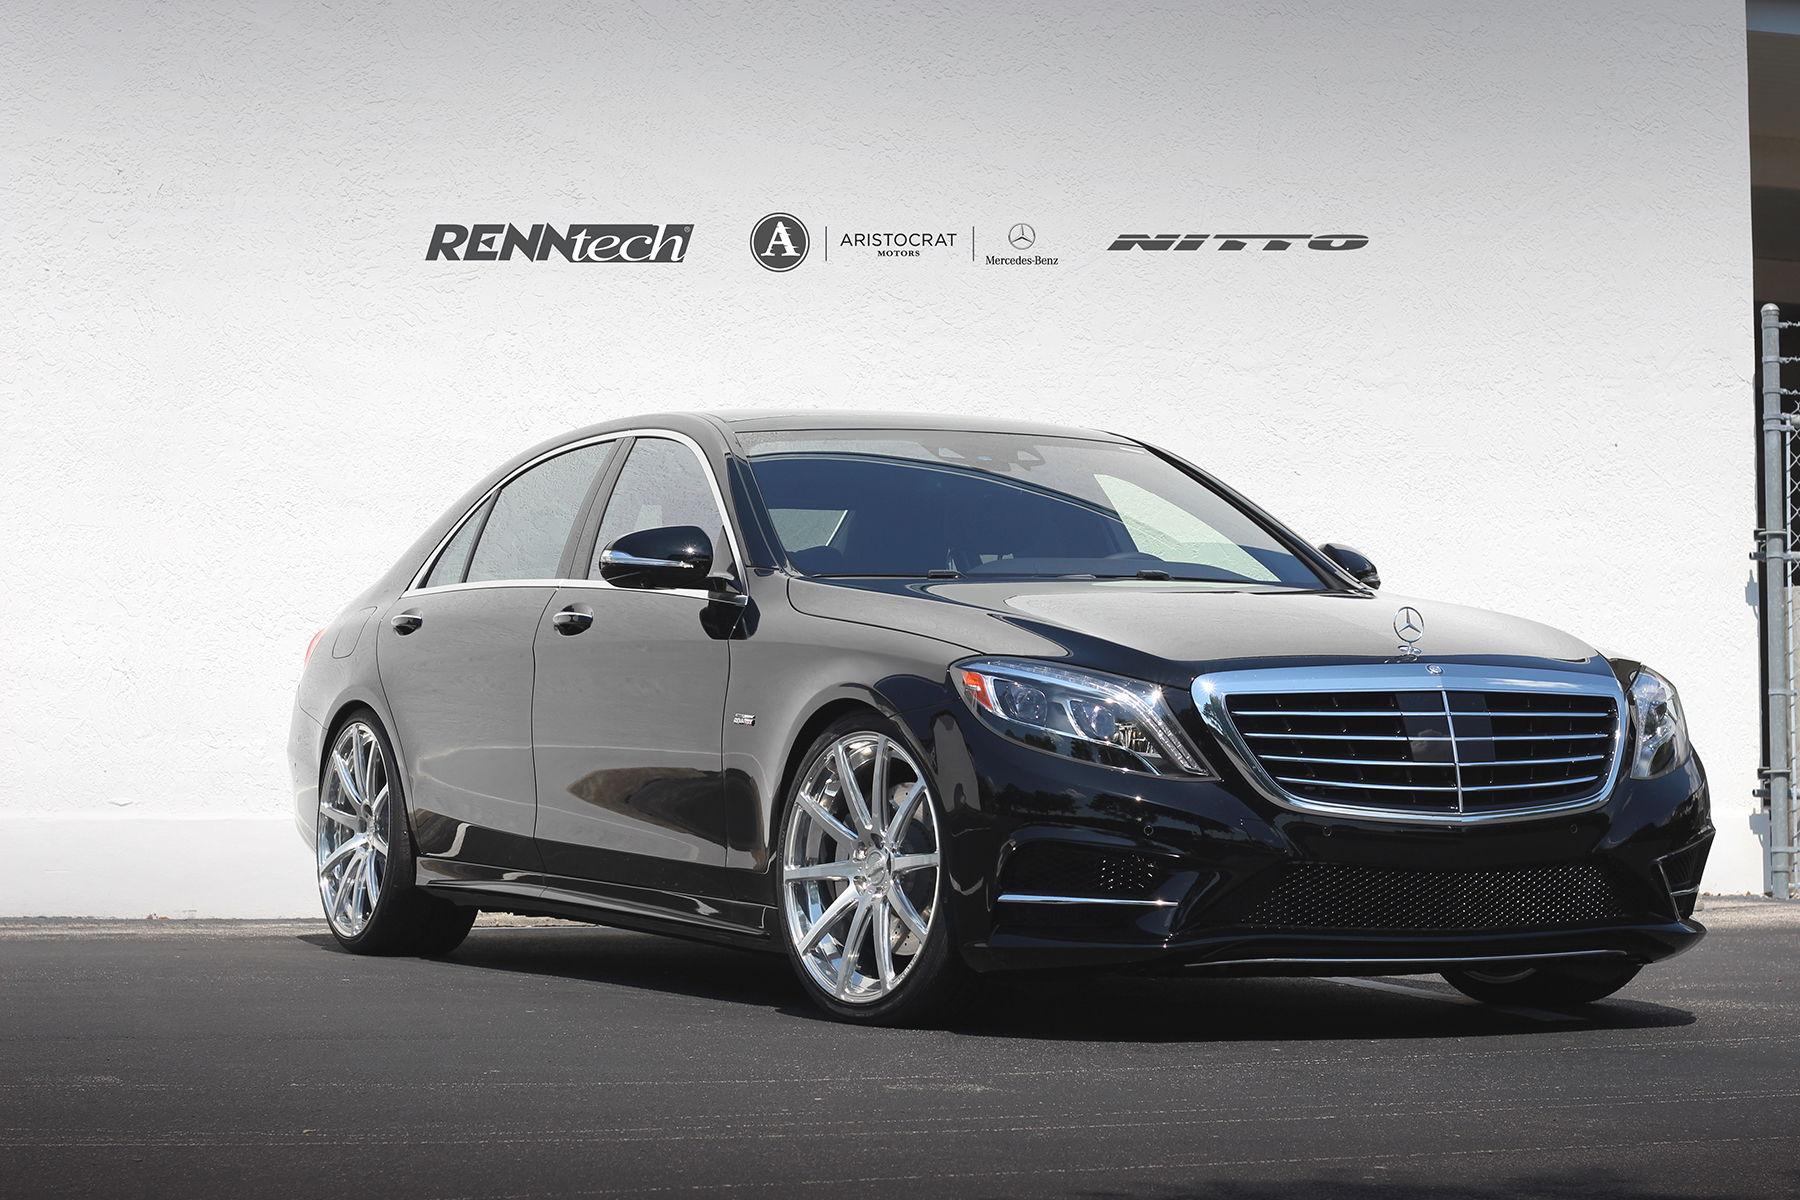 Mercedes benz s 550 renntech aristocrat mbworld for Mercedes benz 550 amg